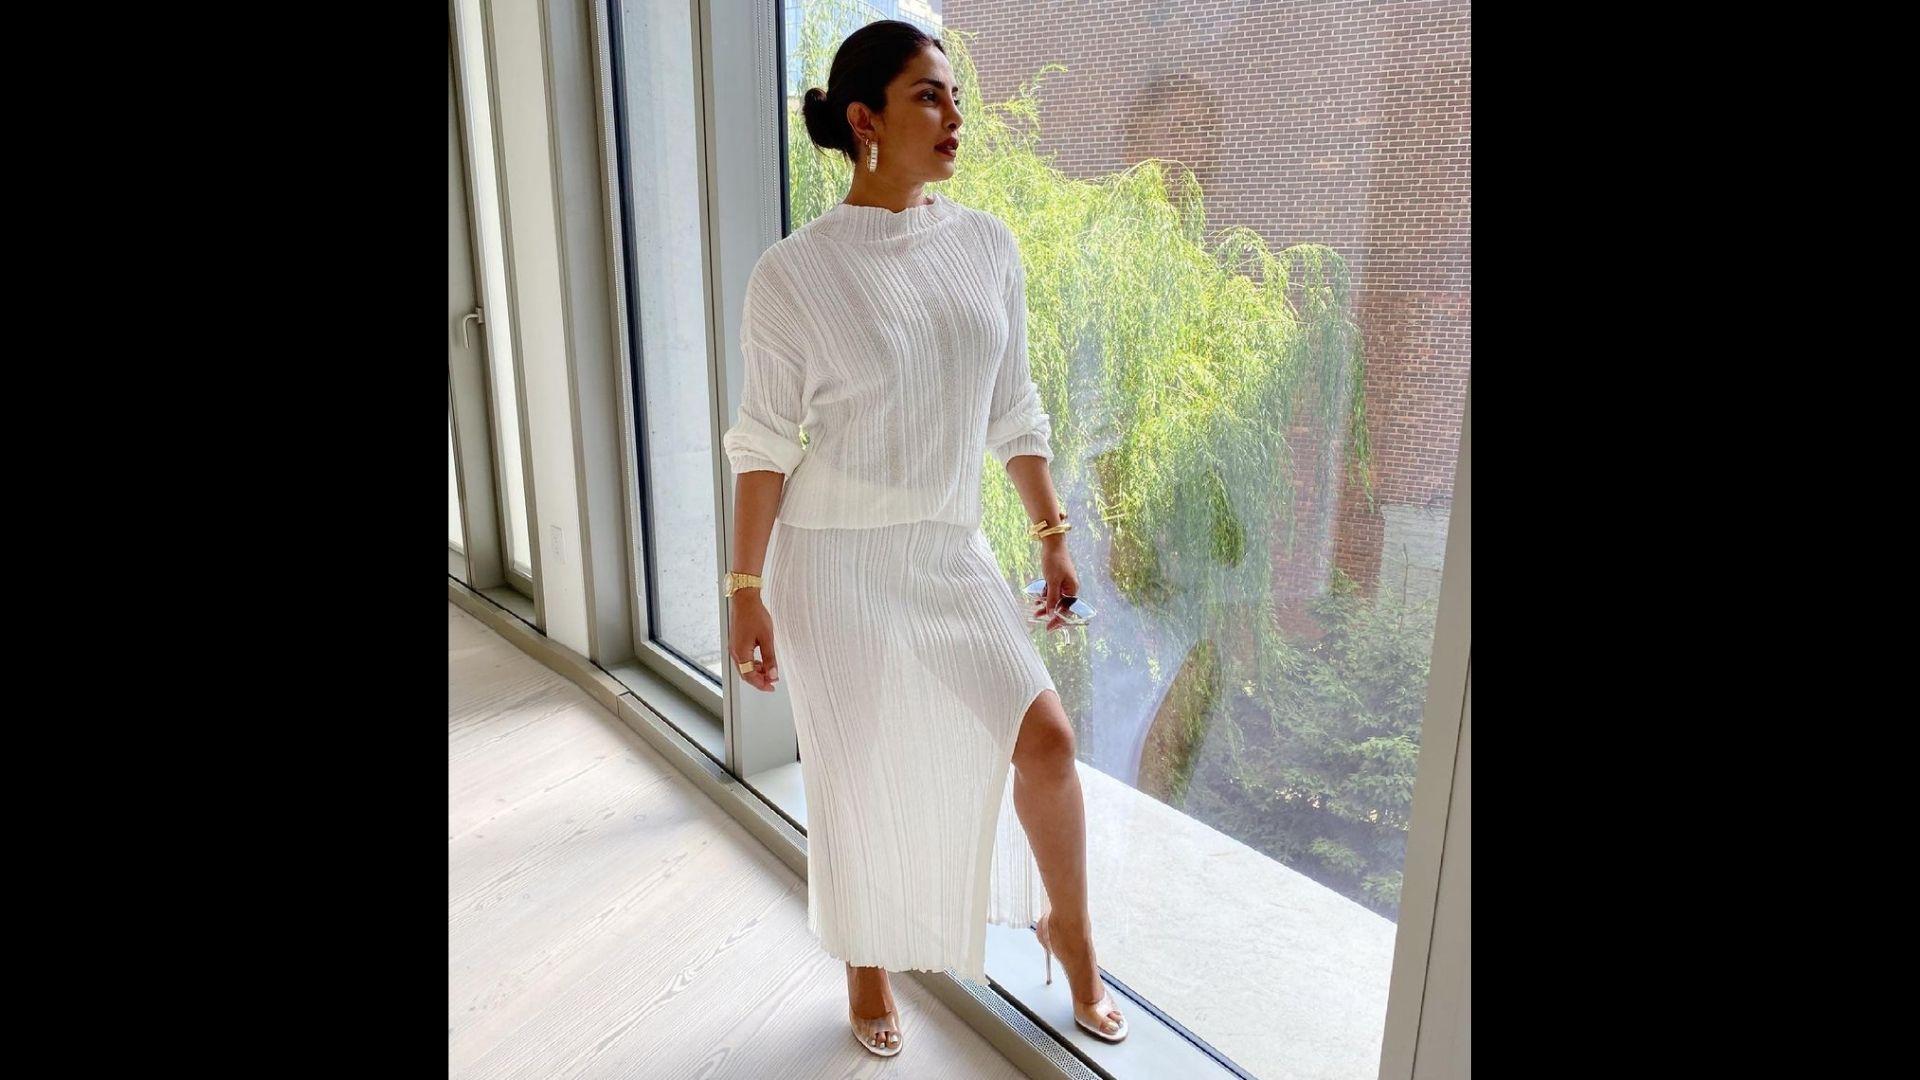 Priyanka Chopra Jonas Gatecrashes Citadel Crew's Party; Shares Pics Via Gram And Sends Fans In A Tizzy